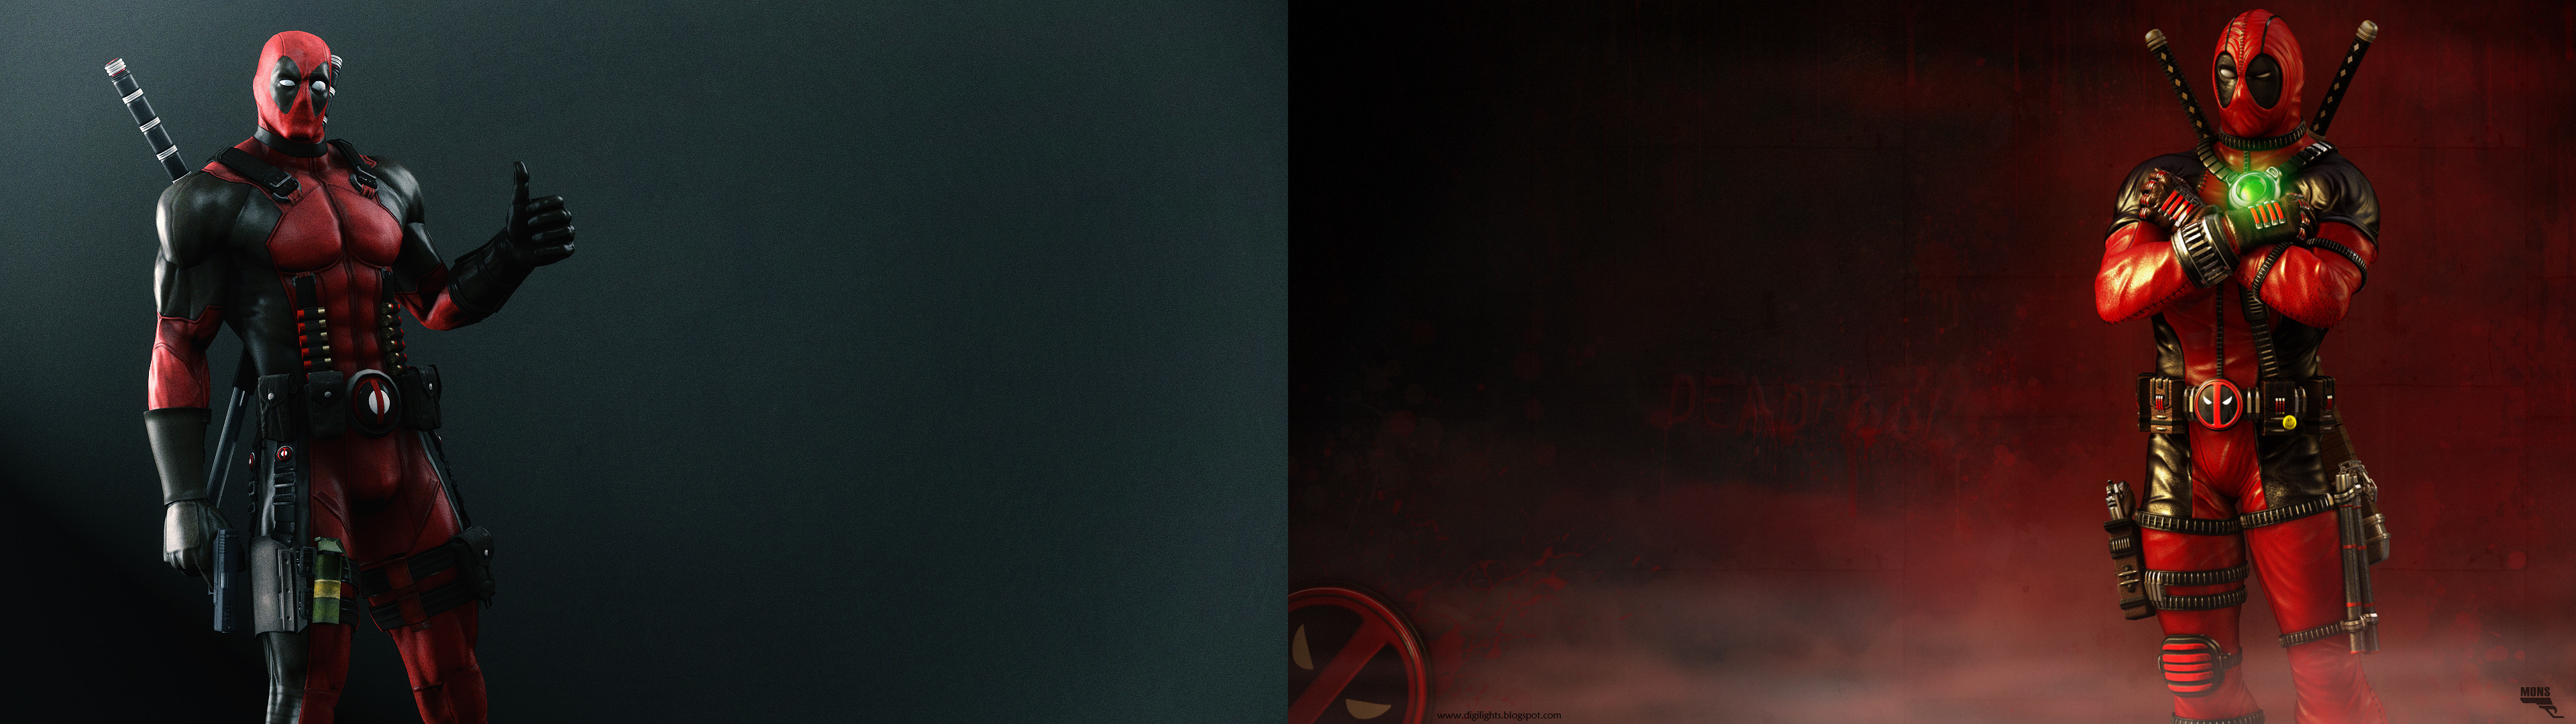 Deadpool Wallpaper (Dual Monitor, …